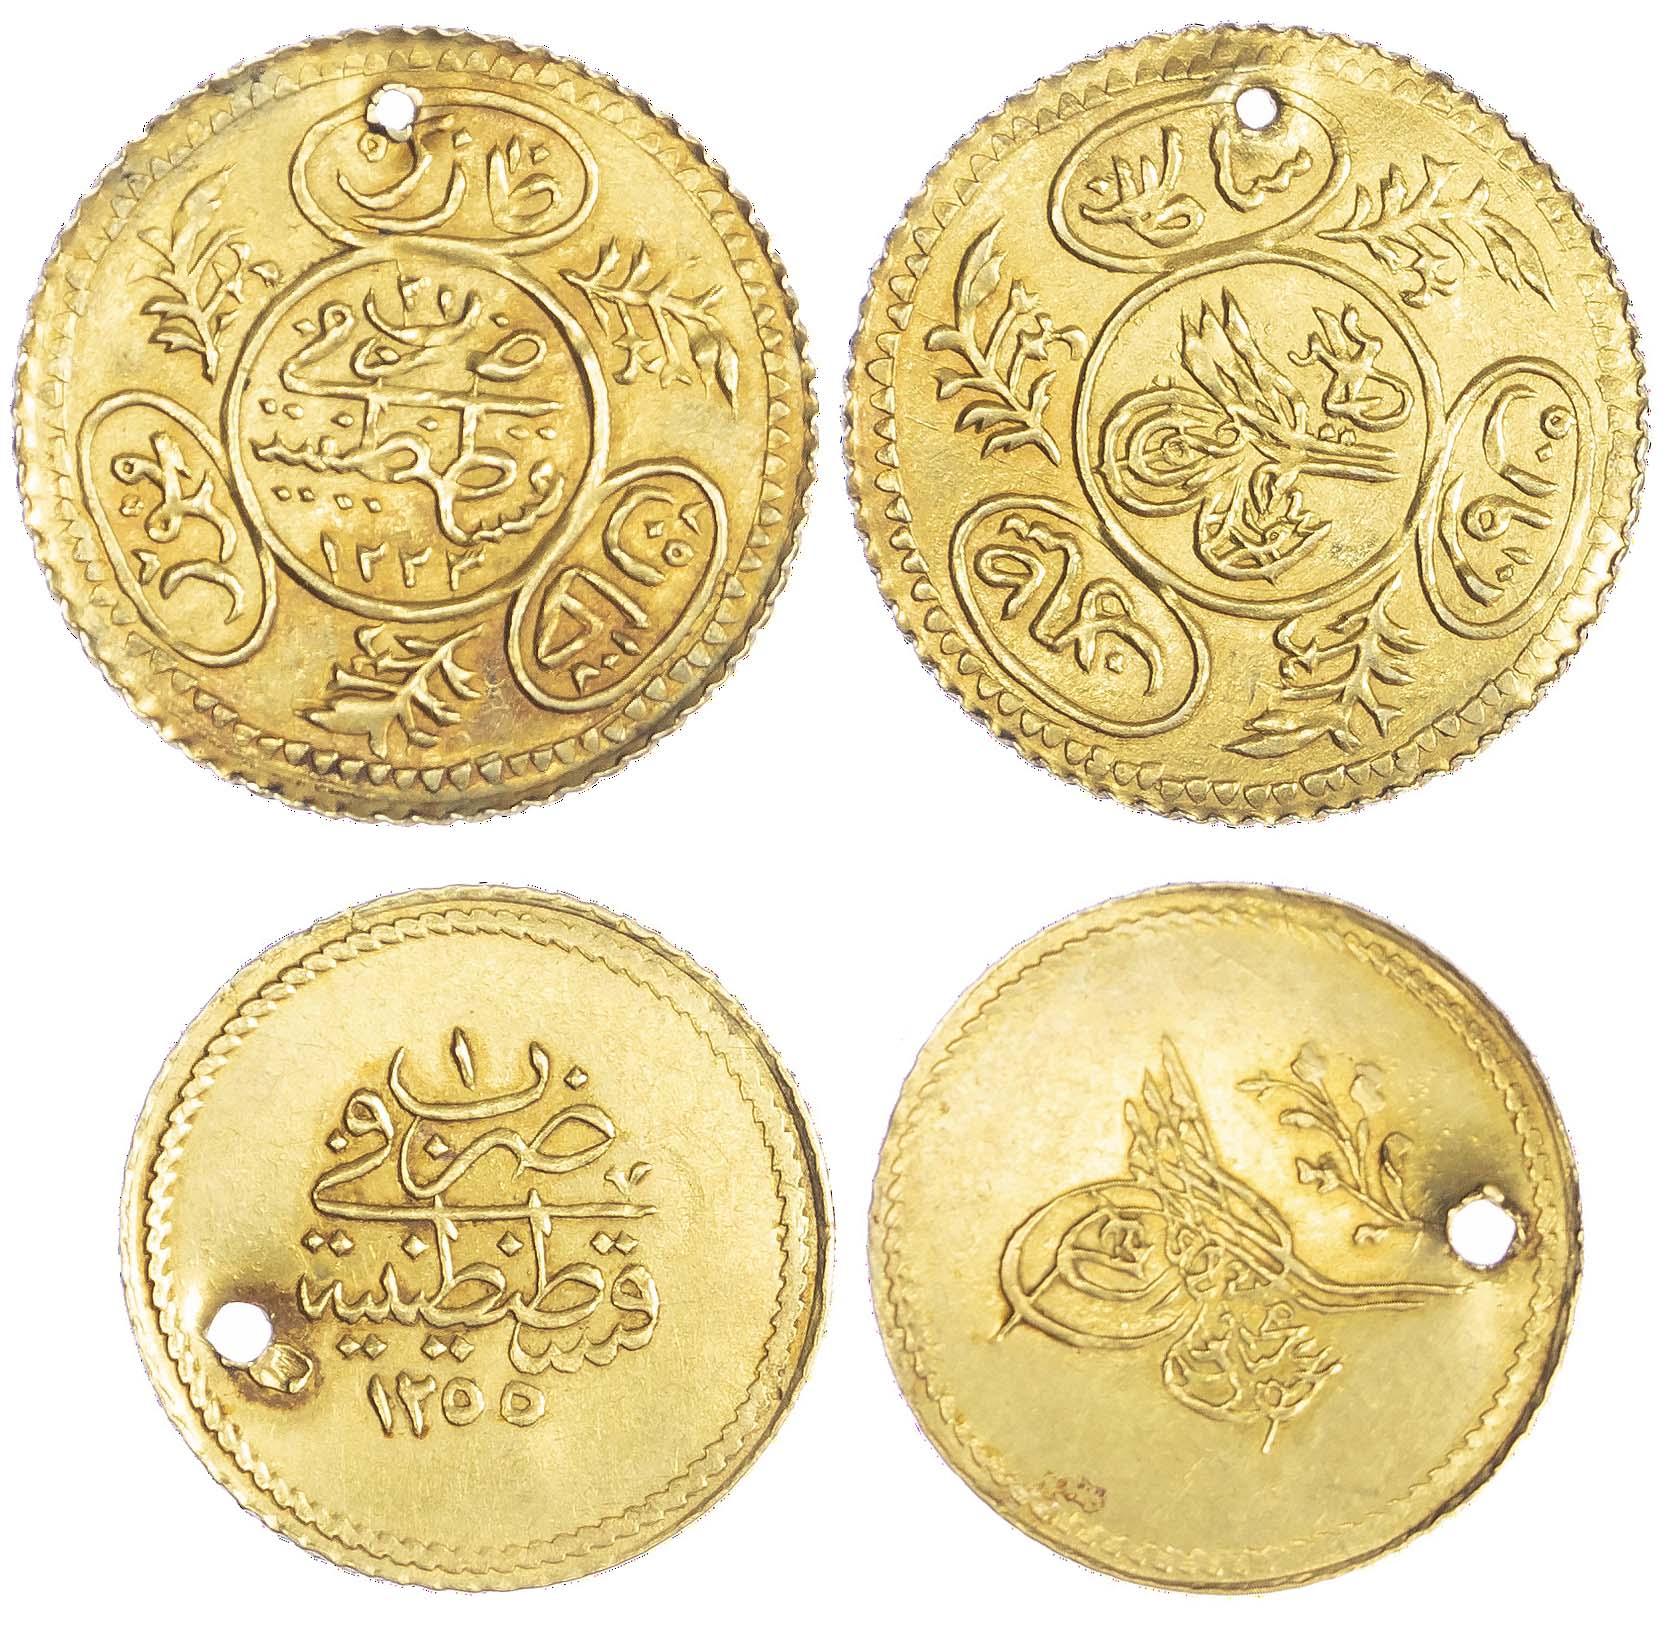 Ottoman Empire, Abdul Mejid (1839-1861), gold Memduhiye Altin and Mahmud II (1808-1839), gold Hayriye - Qustantiniya mint